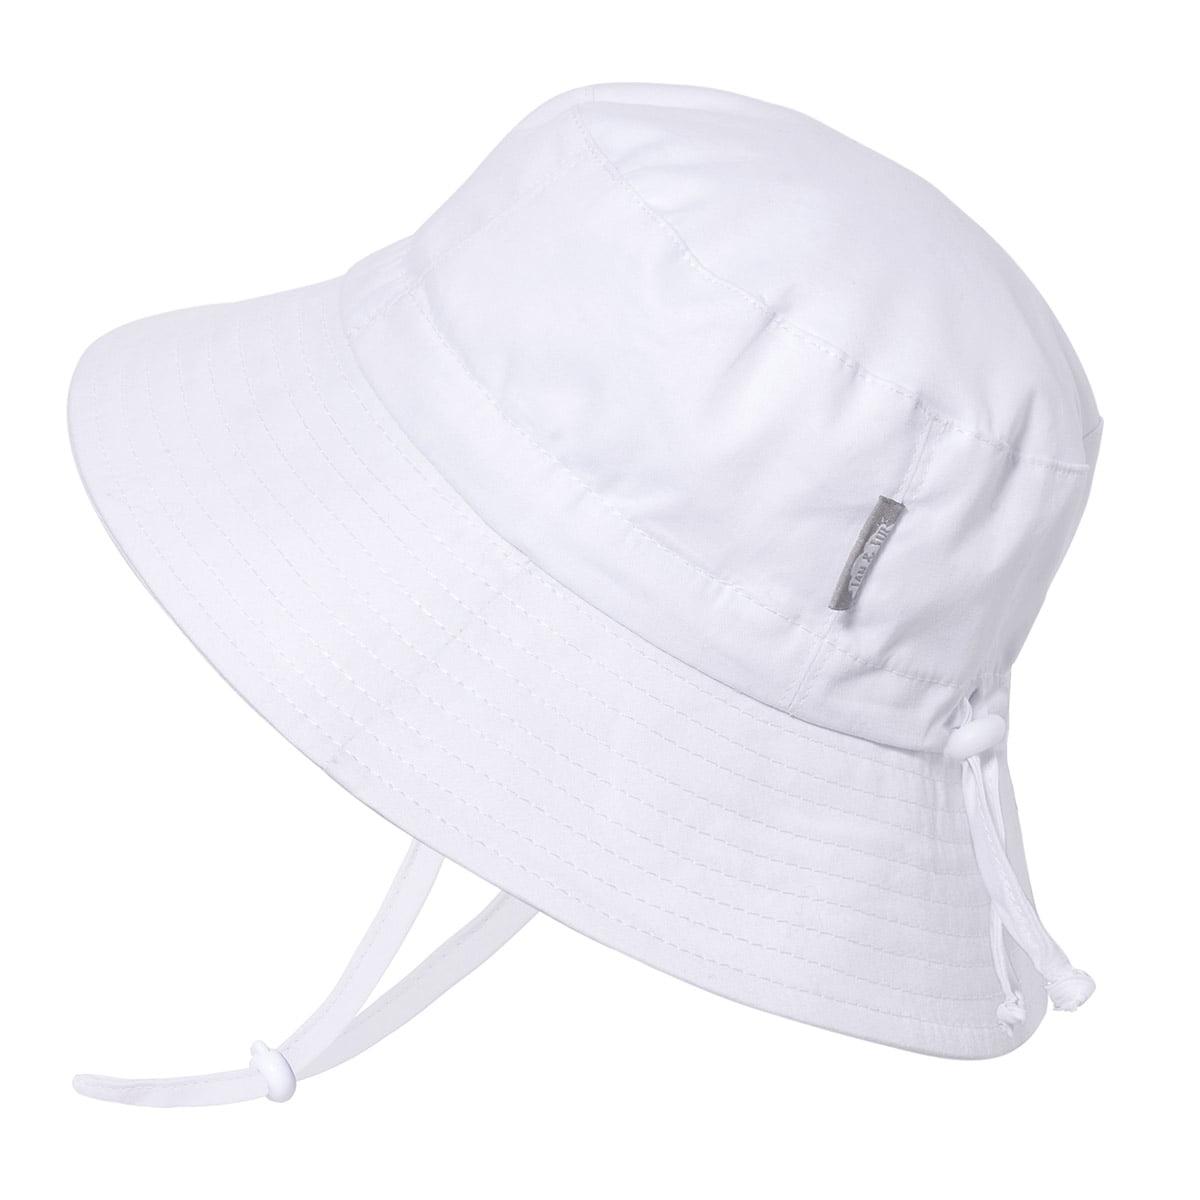 Hat for 4-12y Kids Sun Hat with Neck Flap Adjustable Children Wide Brim UPF50